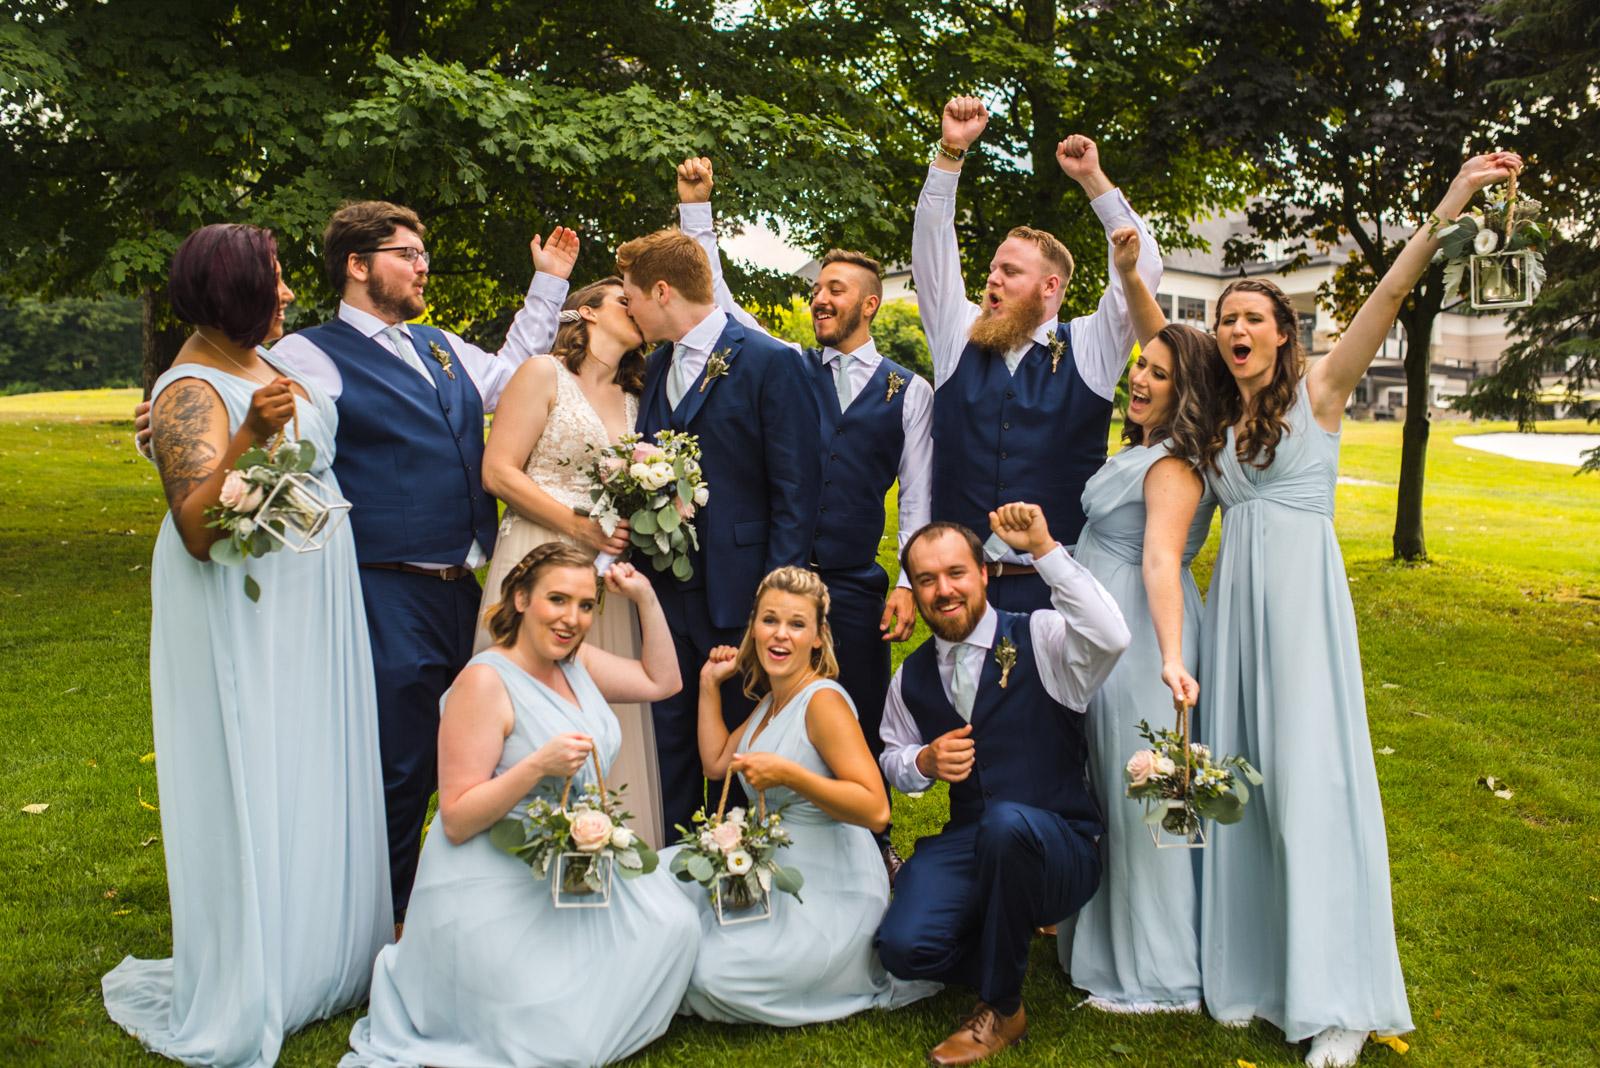 Emerson & Elicia's Golf Course Wedding Aidan & Leanne Hennebry Hamilton Wedding Videographers Photographers Niagara Hush Hush Photography & Film-43.jpg